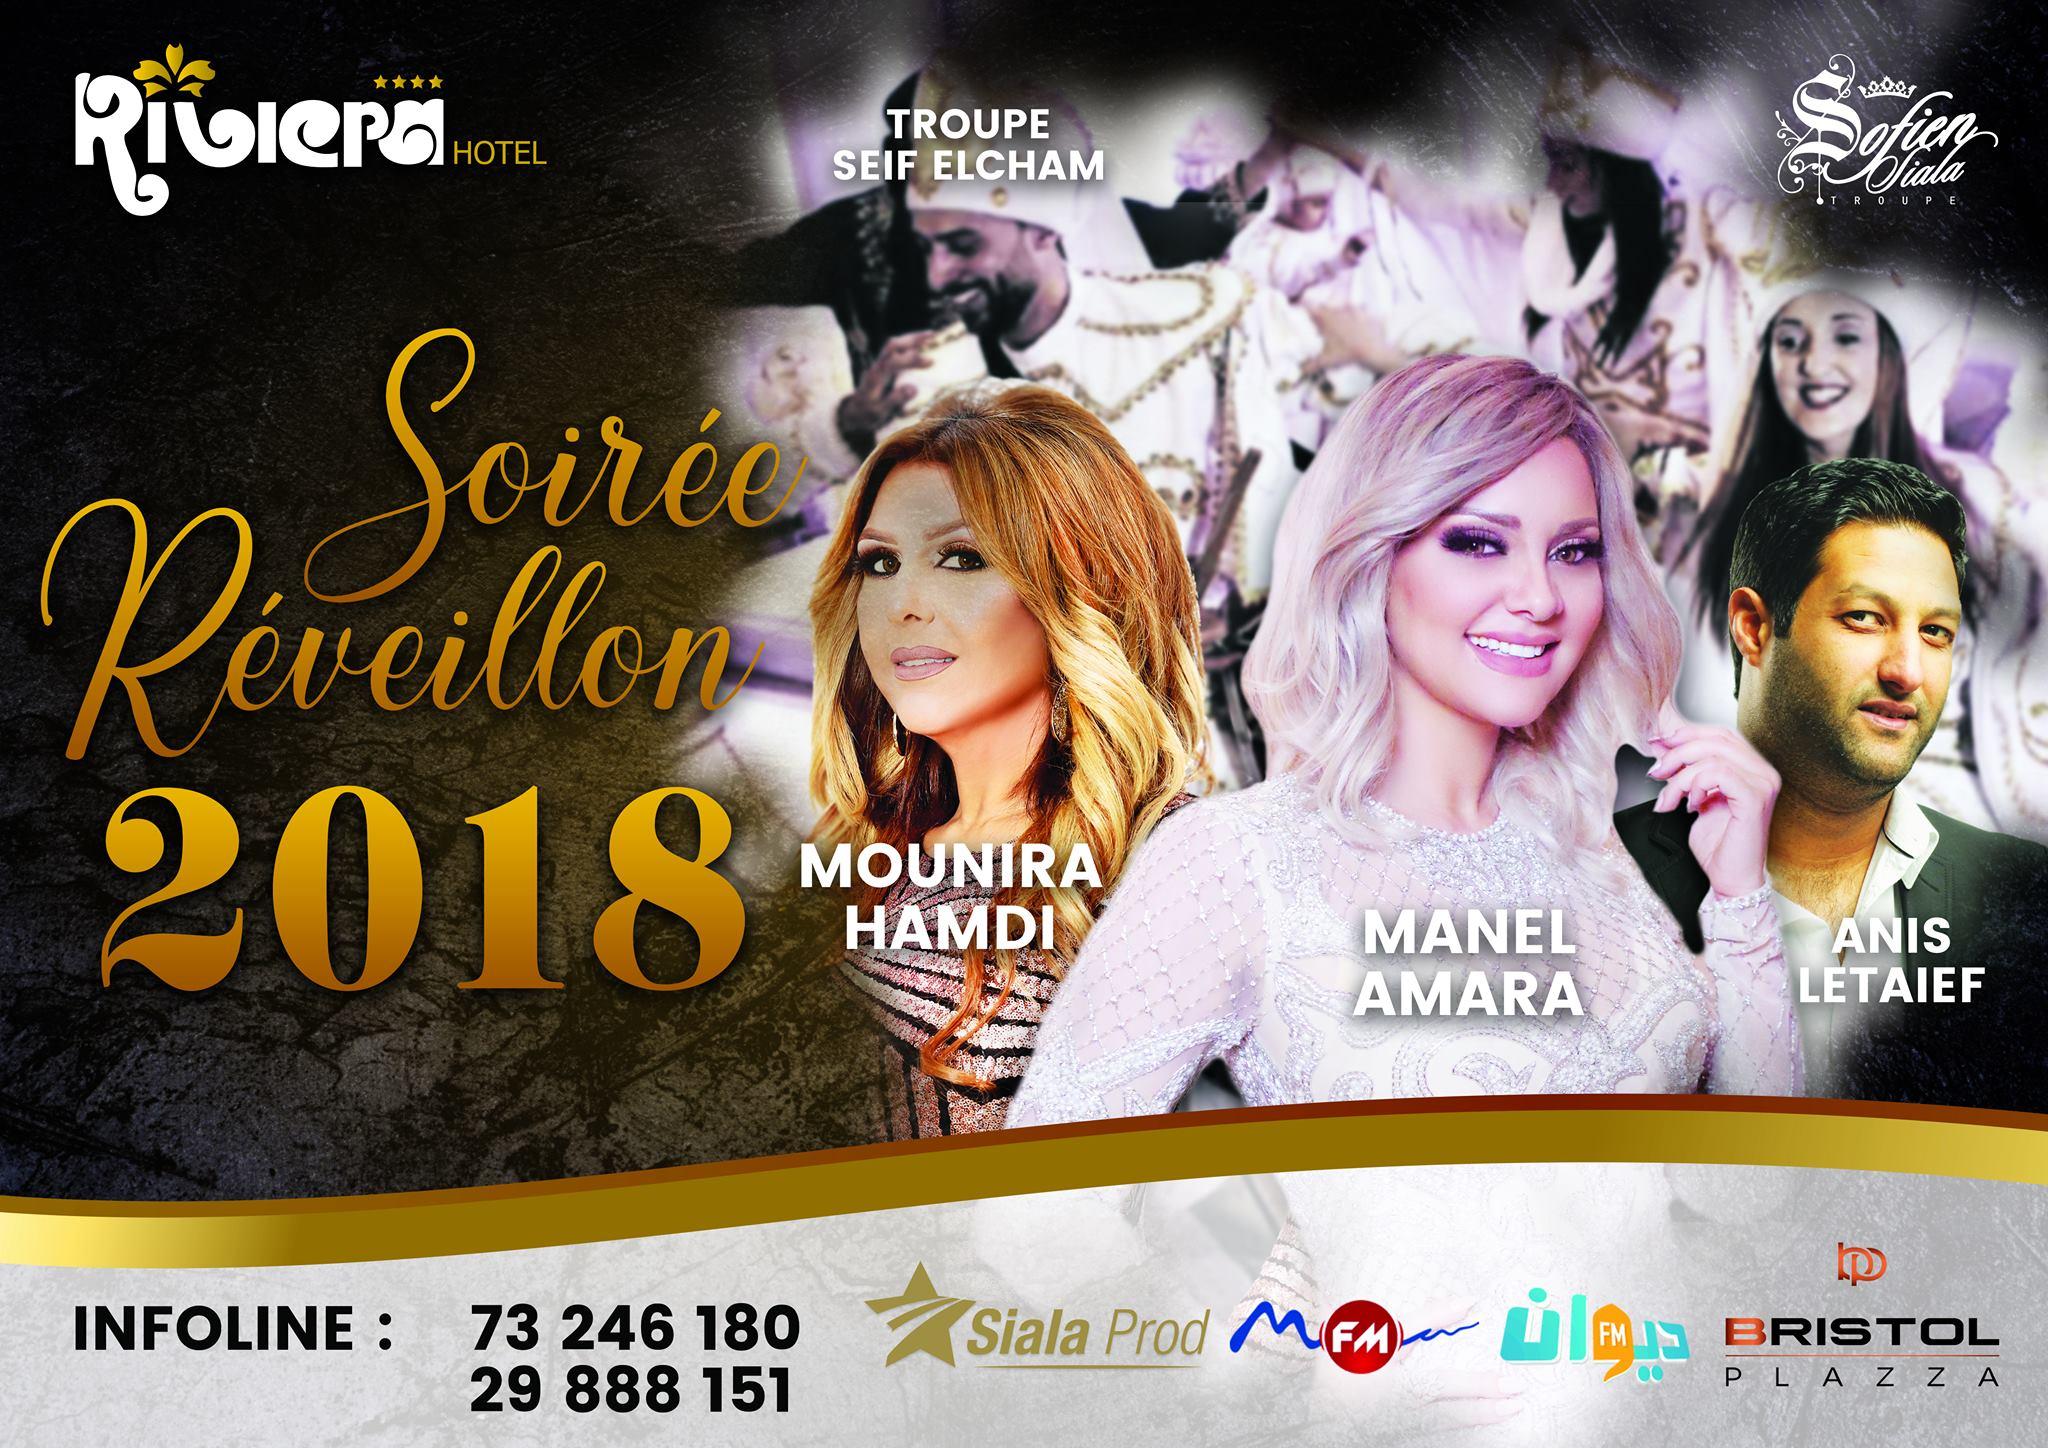 soiree reveillon 2018 - Hotel Riviera Sousse Avec Manel Amara, Mounira Hamdi et Anis Letaief